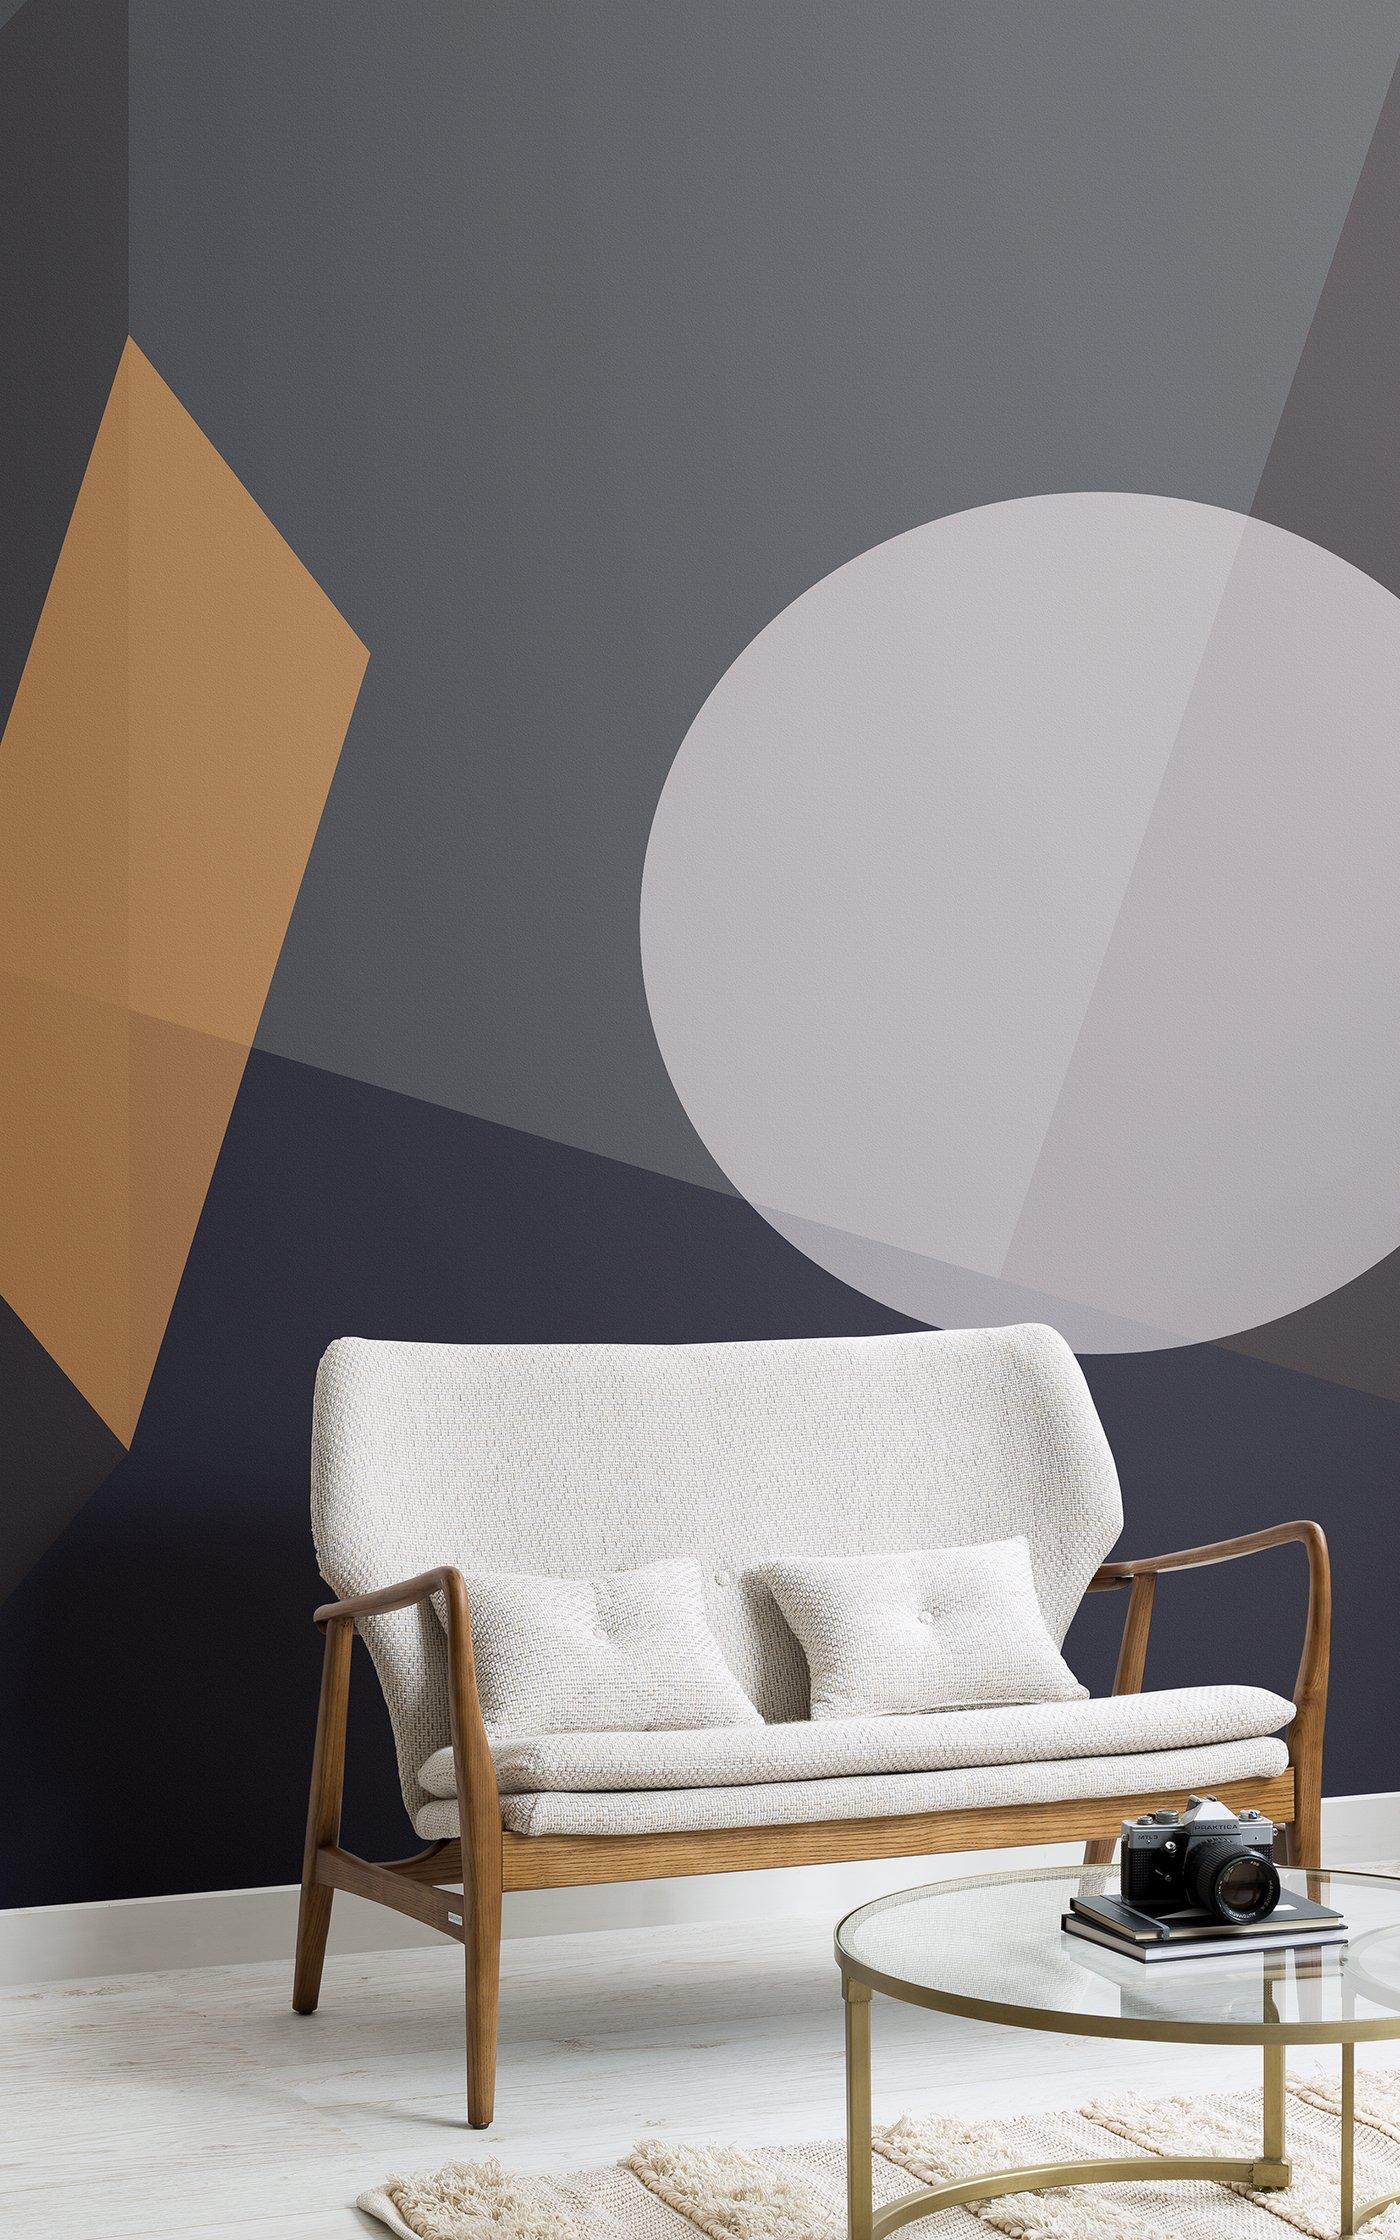 dark abstract shapes wallpaper